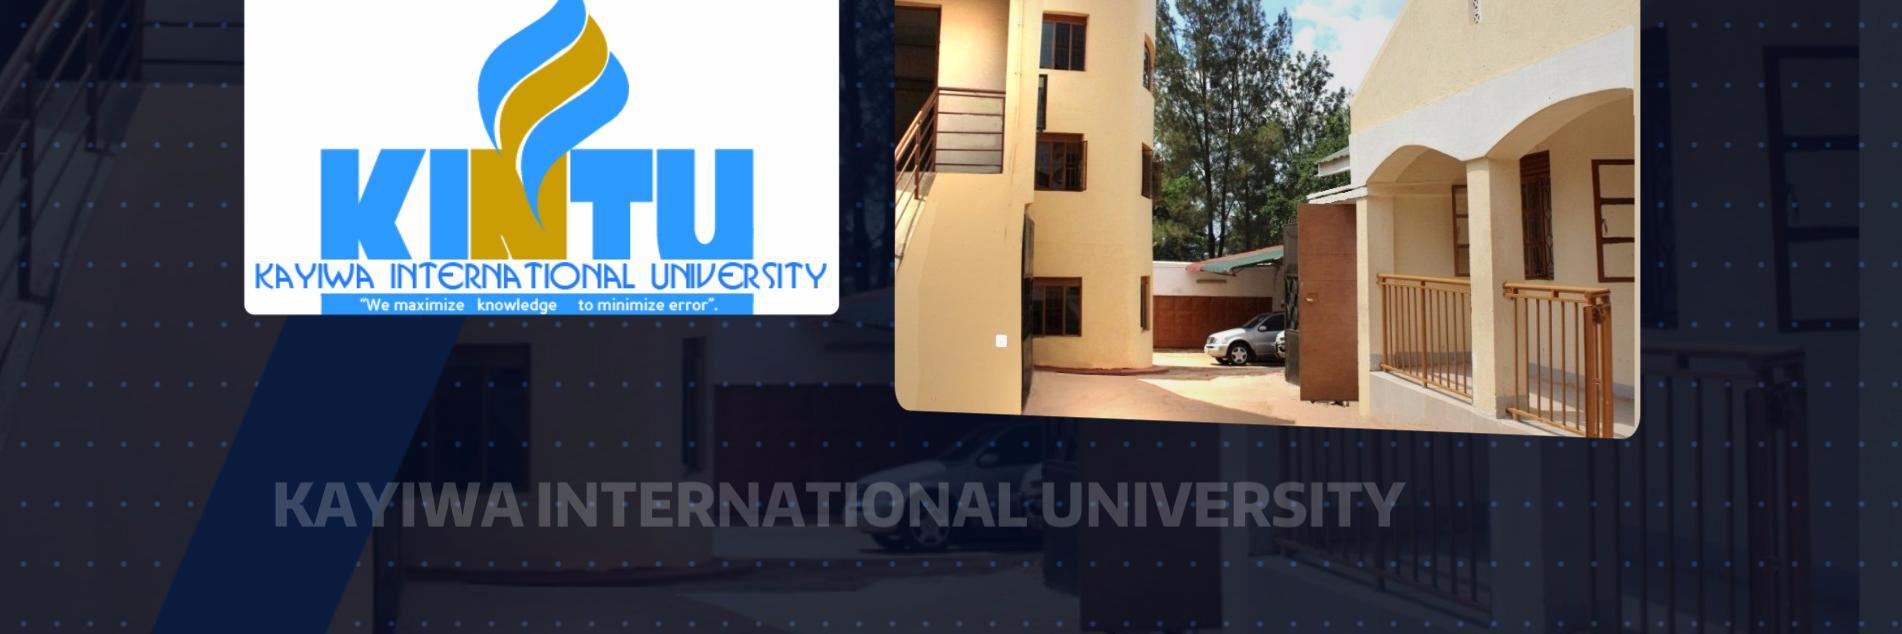 Kayiwa International University's official Twitter account